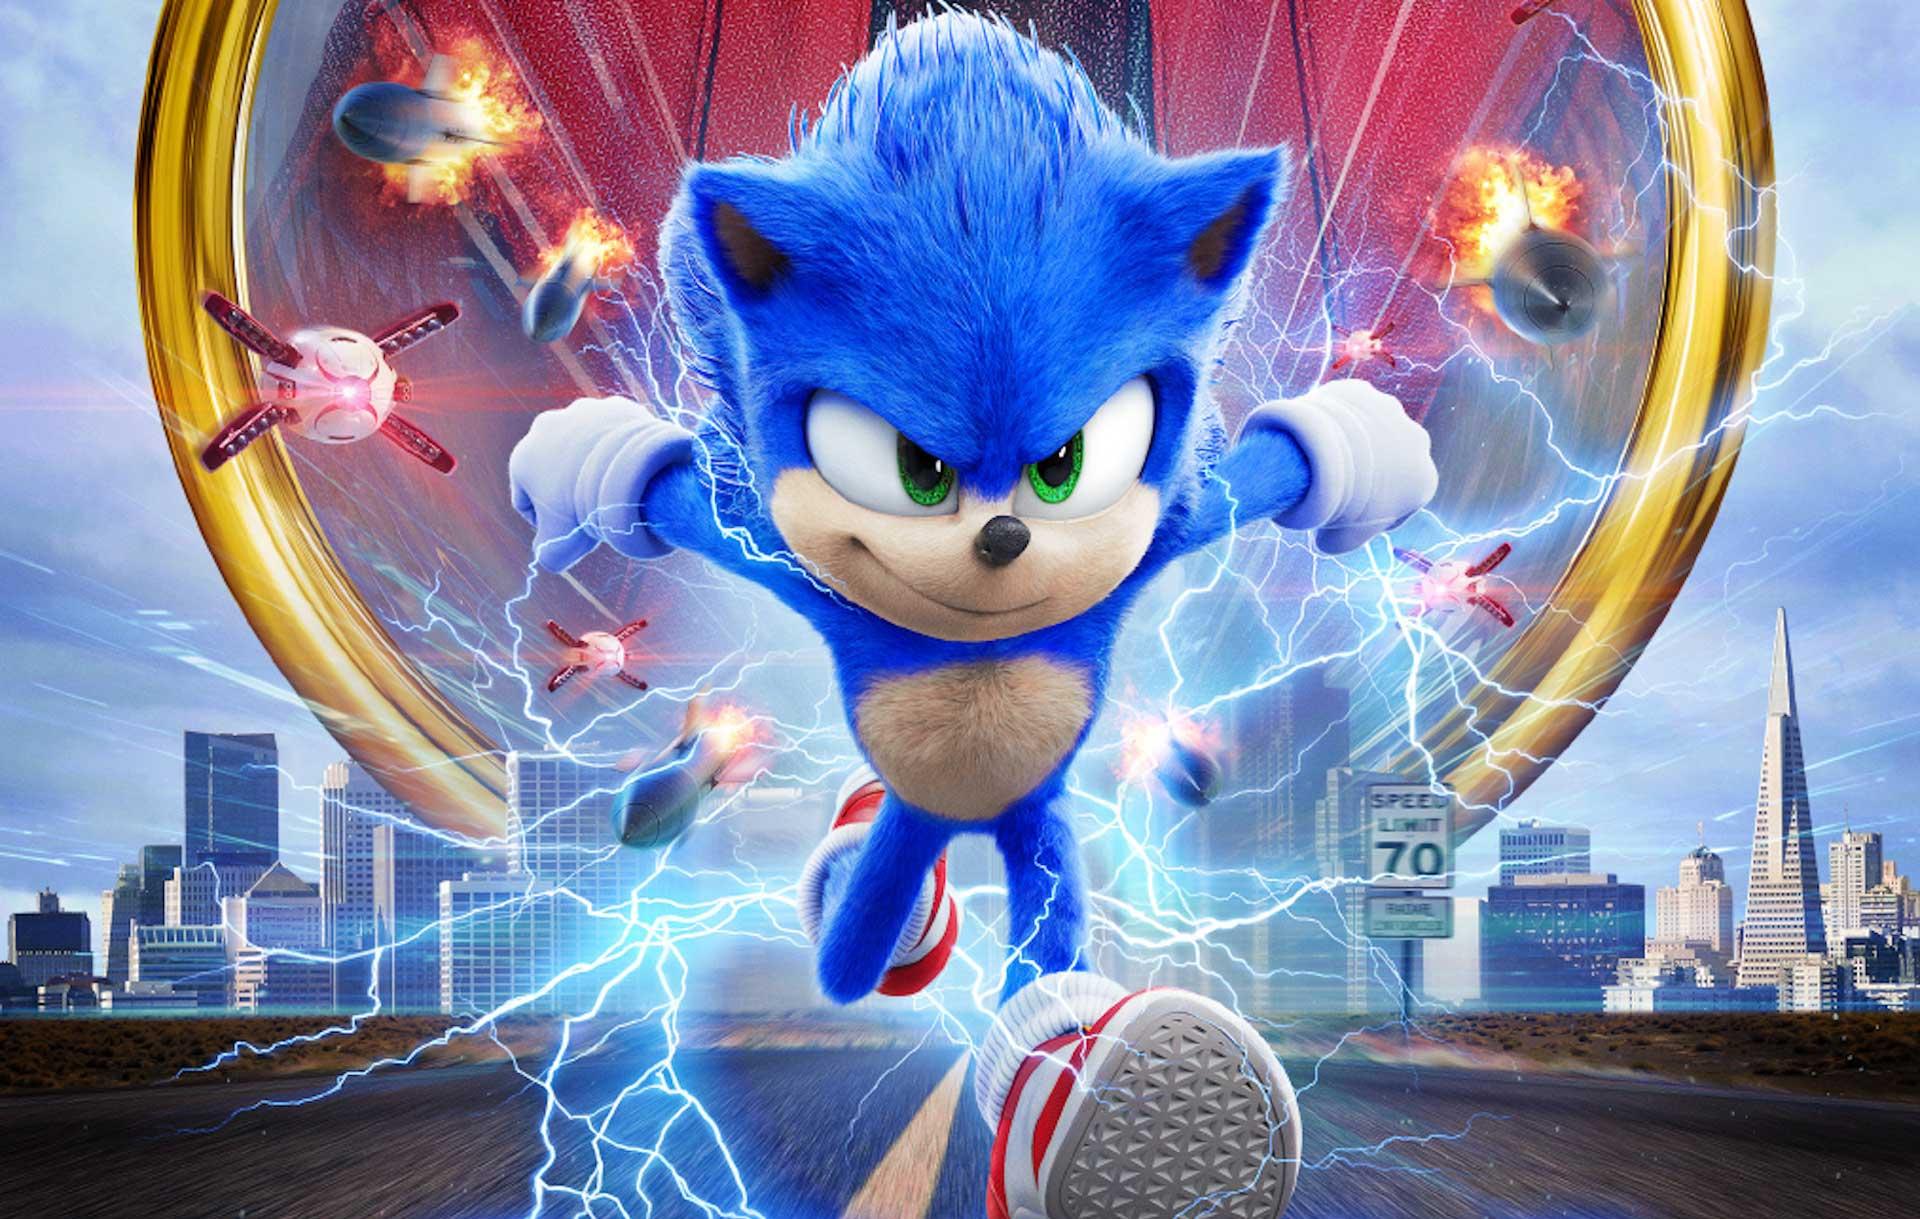 Sonic The Hedgehog Movie Sequel